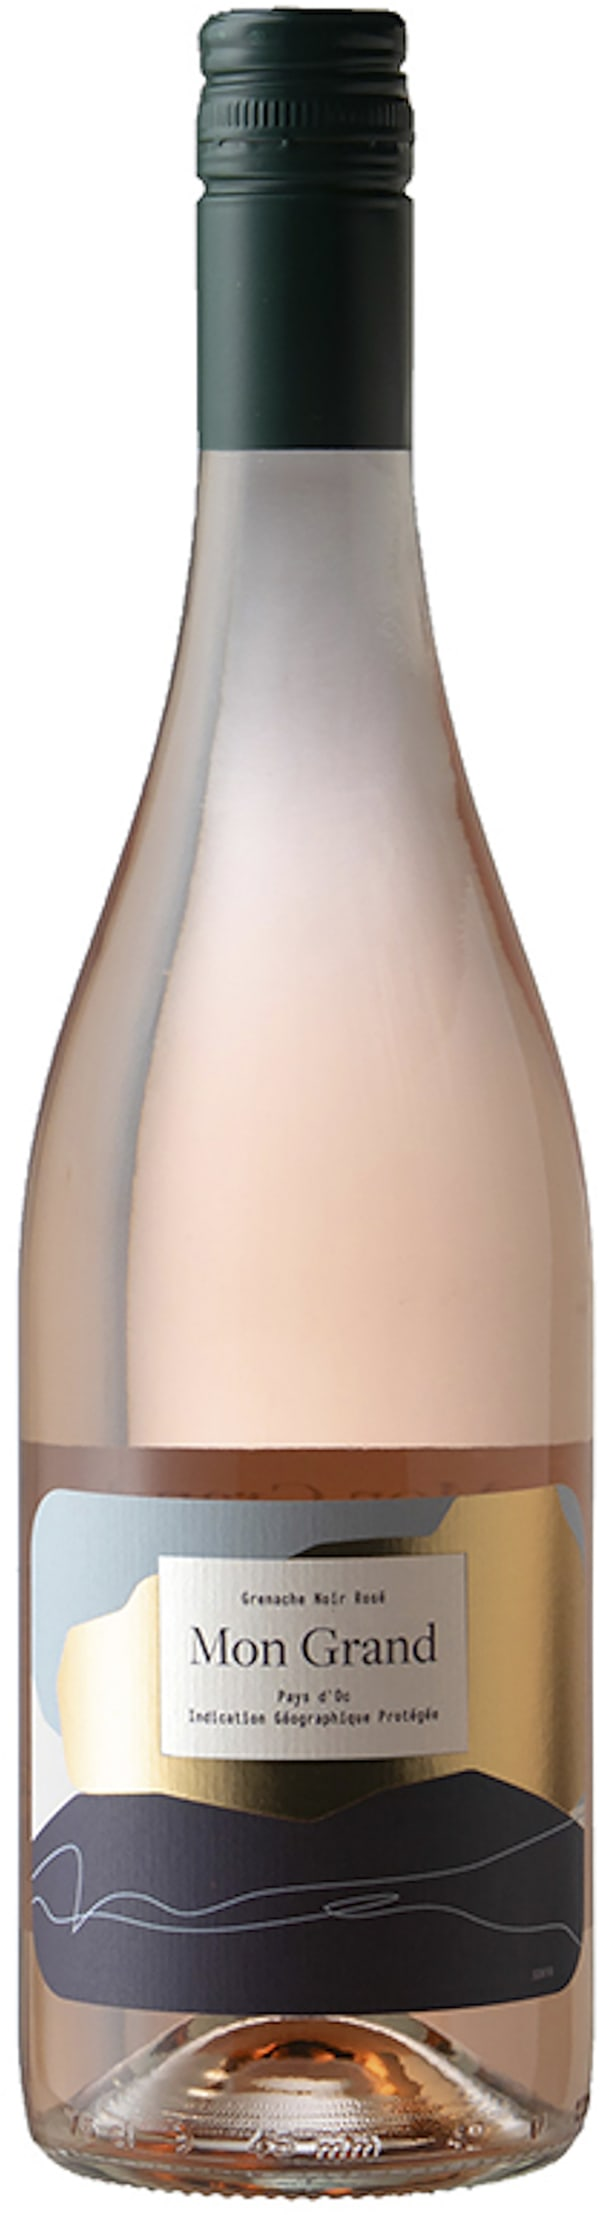 Mon Grand rosé 2018